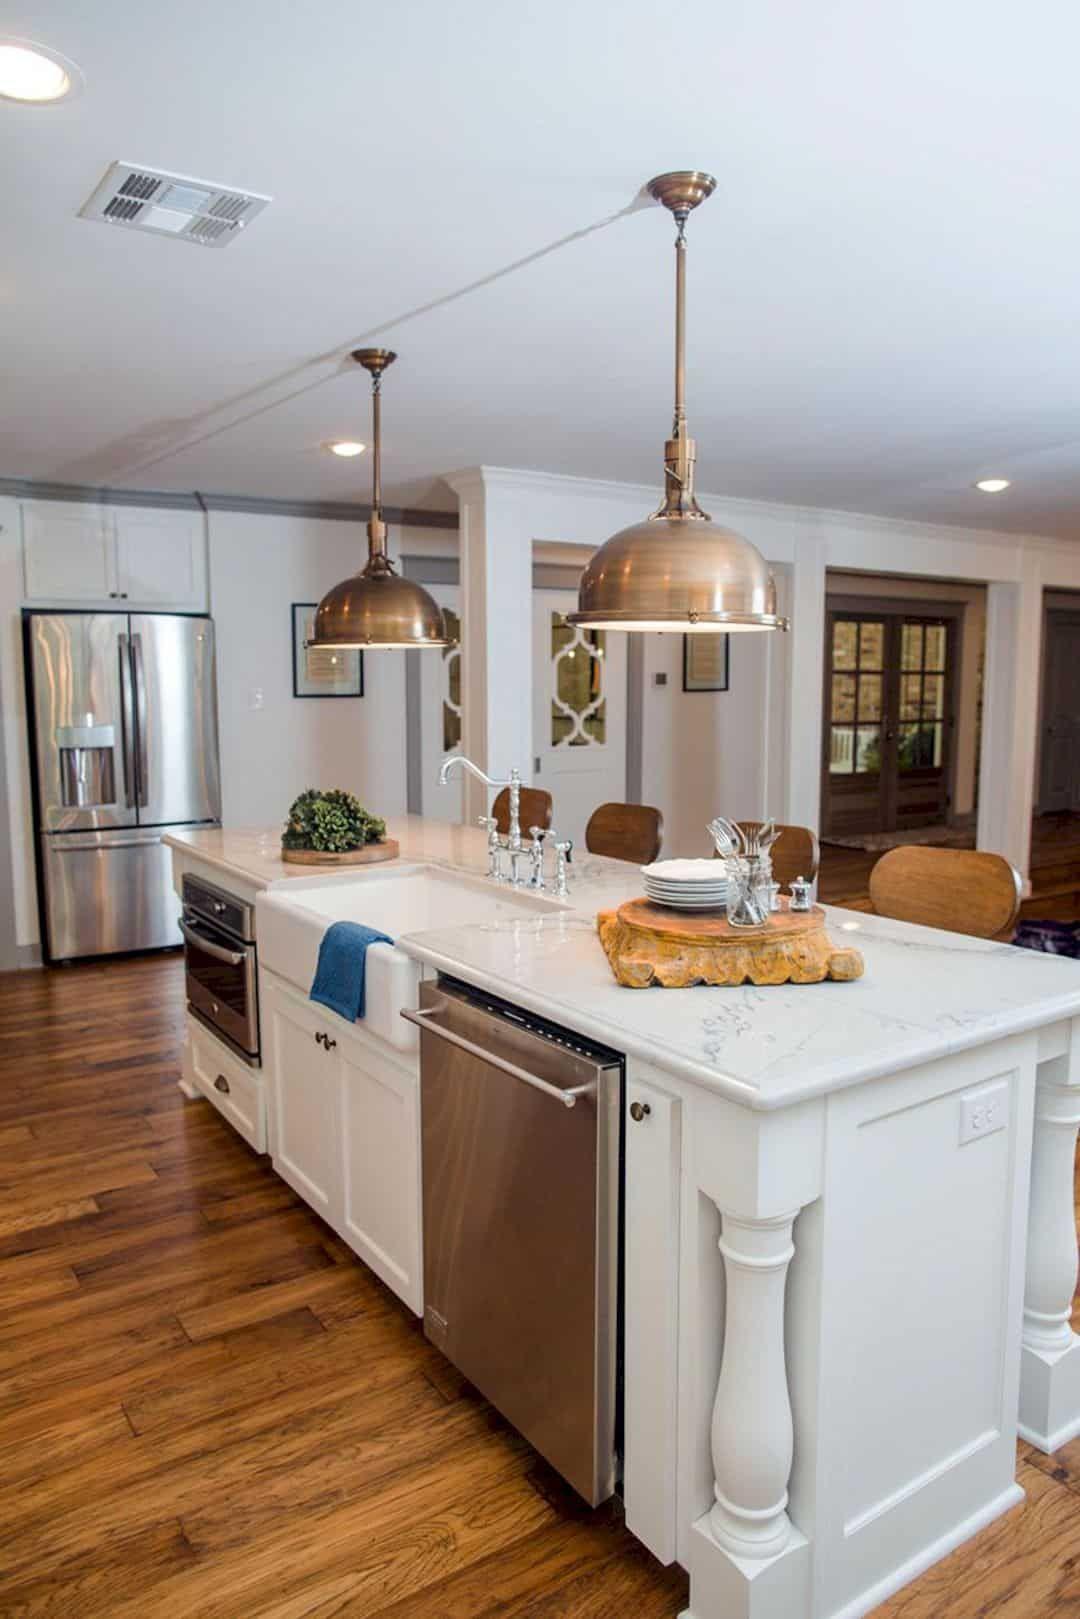 5 kitchen island styles for your home kitchen sink design kitchen island with sink kitchen on kitchen island ideas organization id=74512